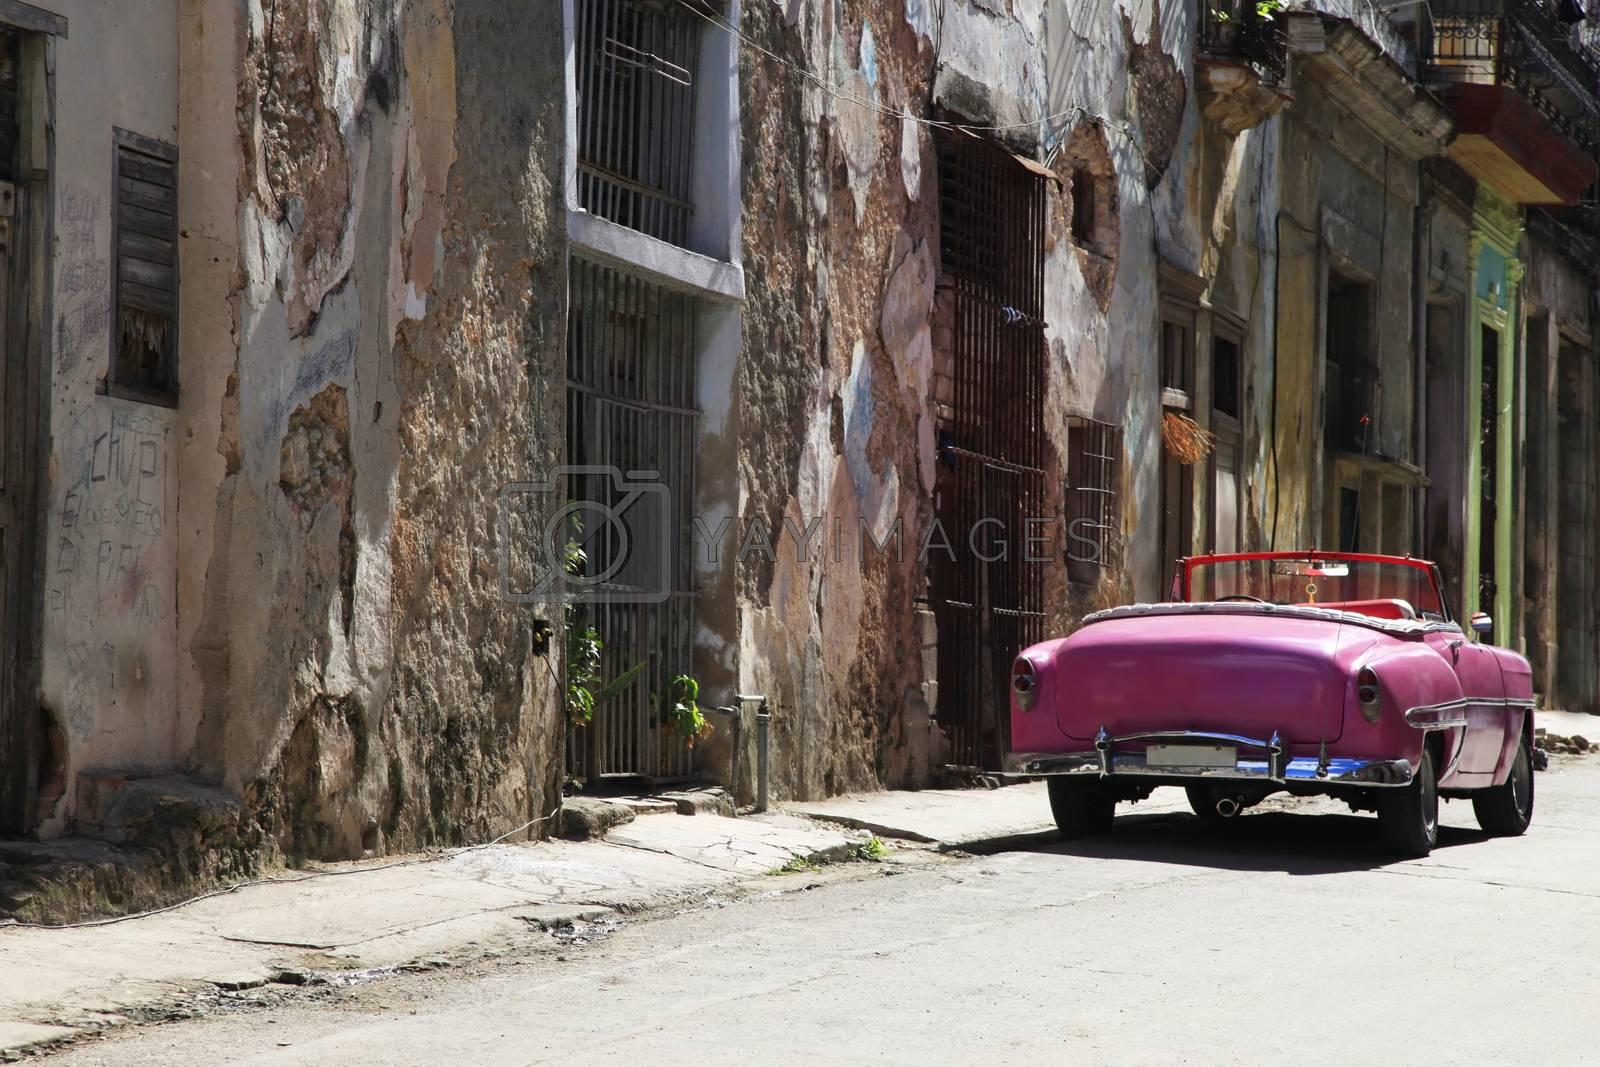 Vintage classic oldtimer car in old town of Havana, Cuba